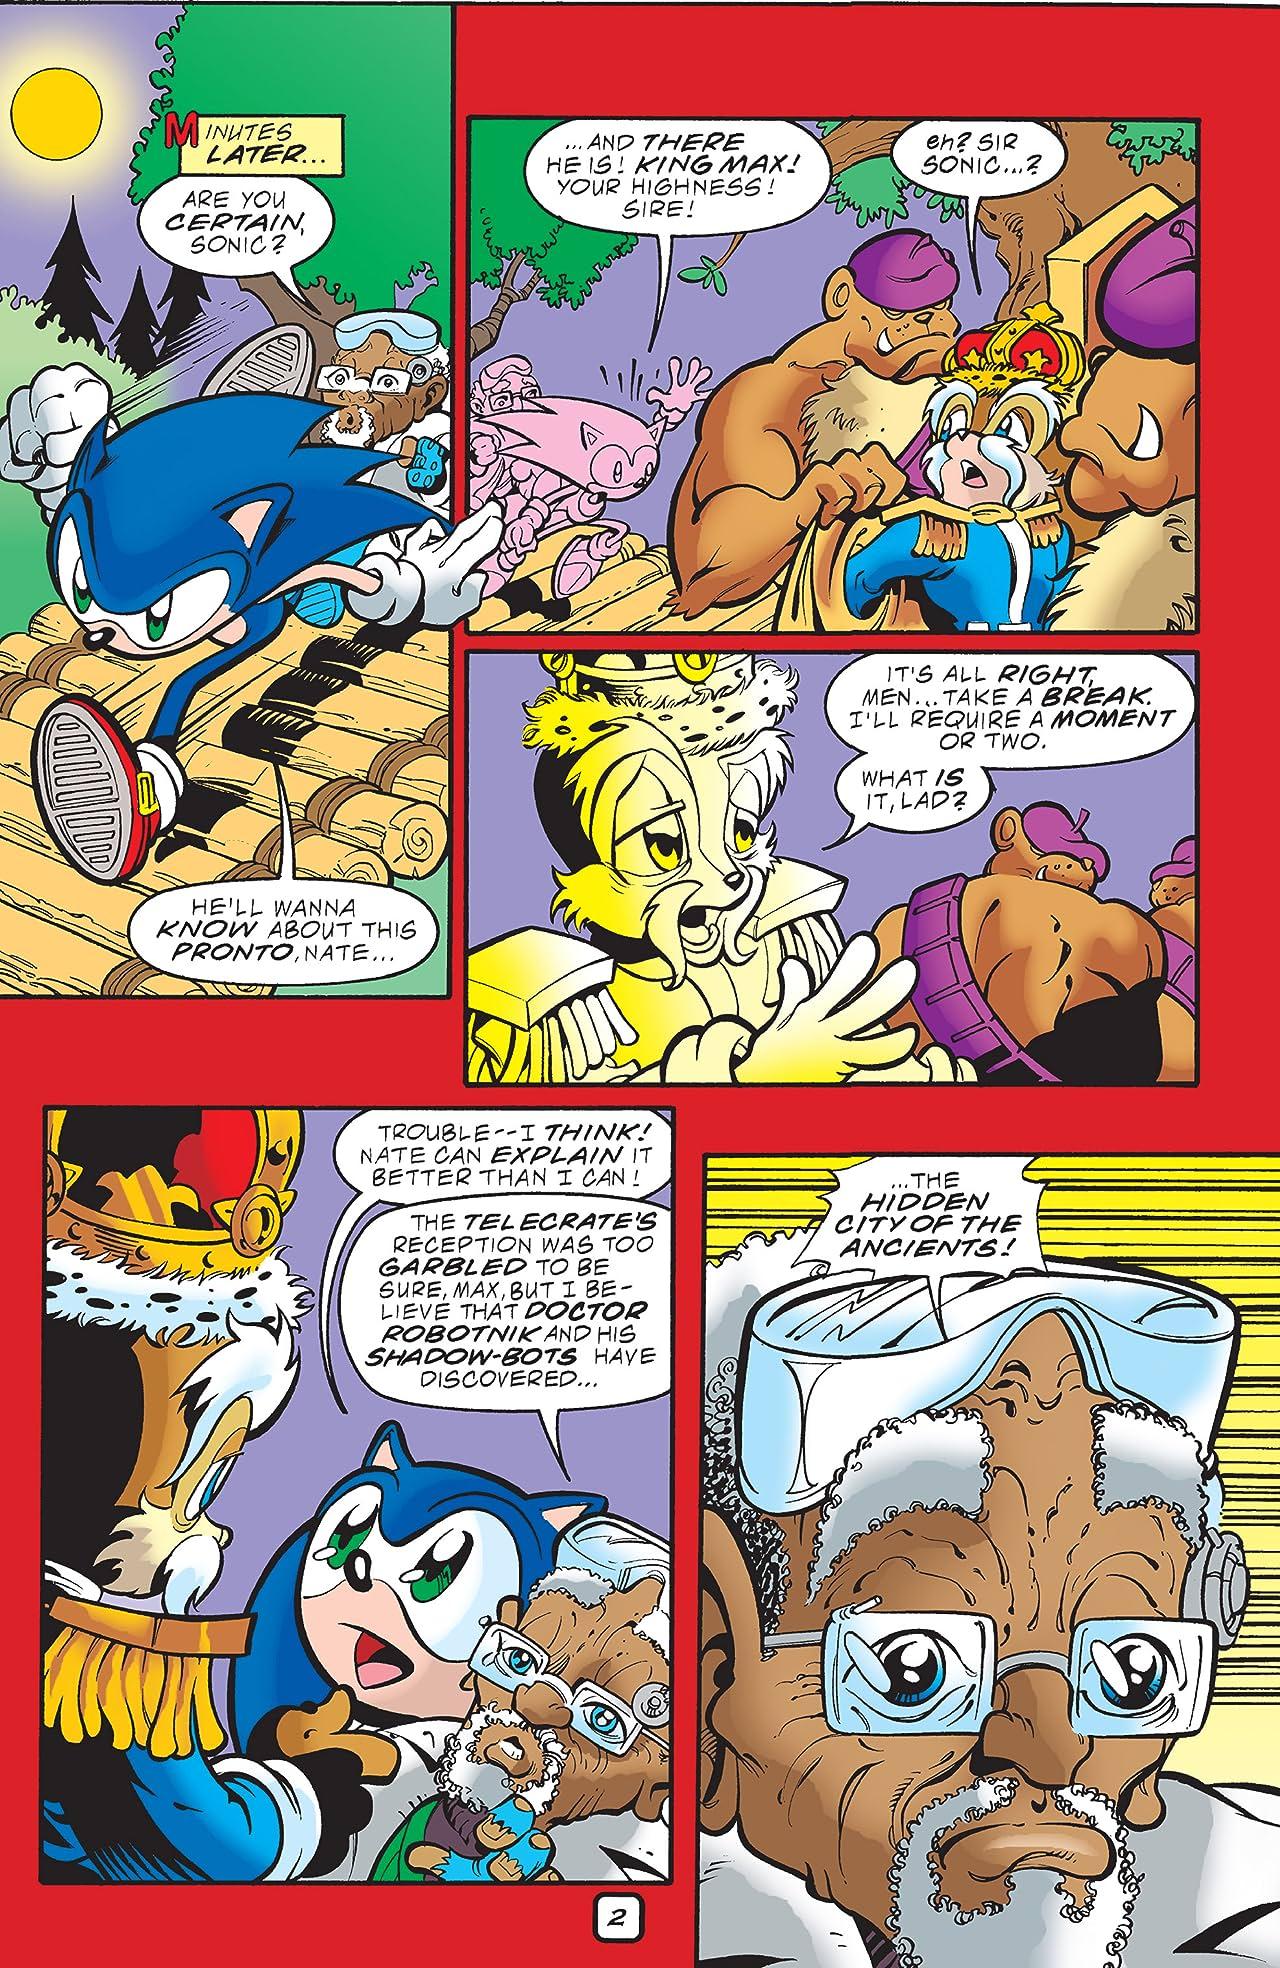 Sonic the Hedgehog #79